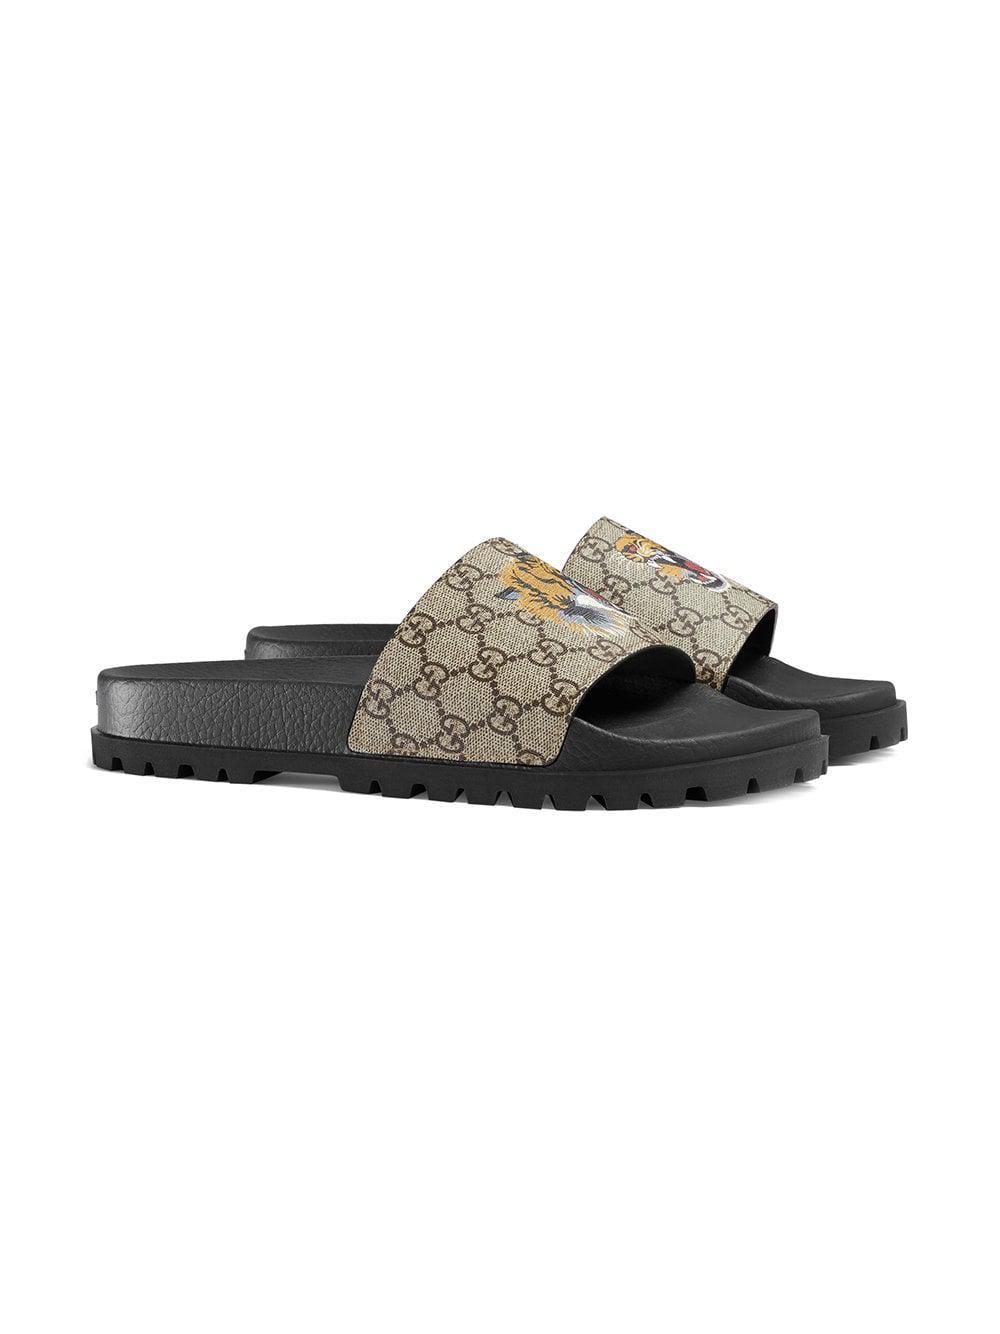 330520e7765d0d Gucci - Brown GG Supreme Tiger Slide Sandal for Men - Lyst. View fullscreen